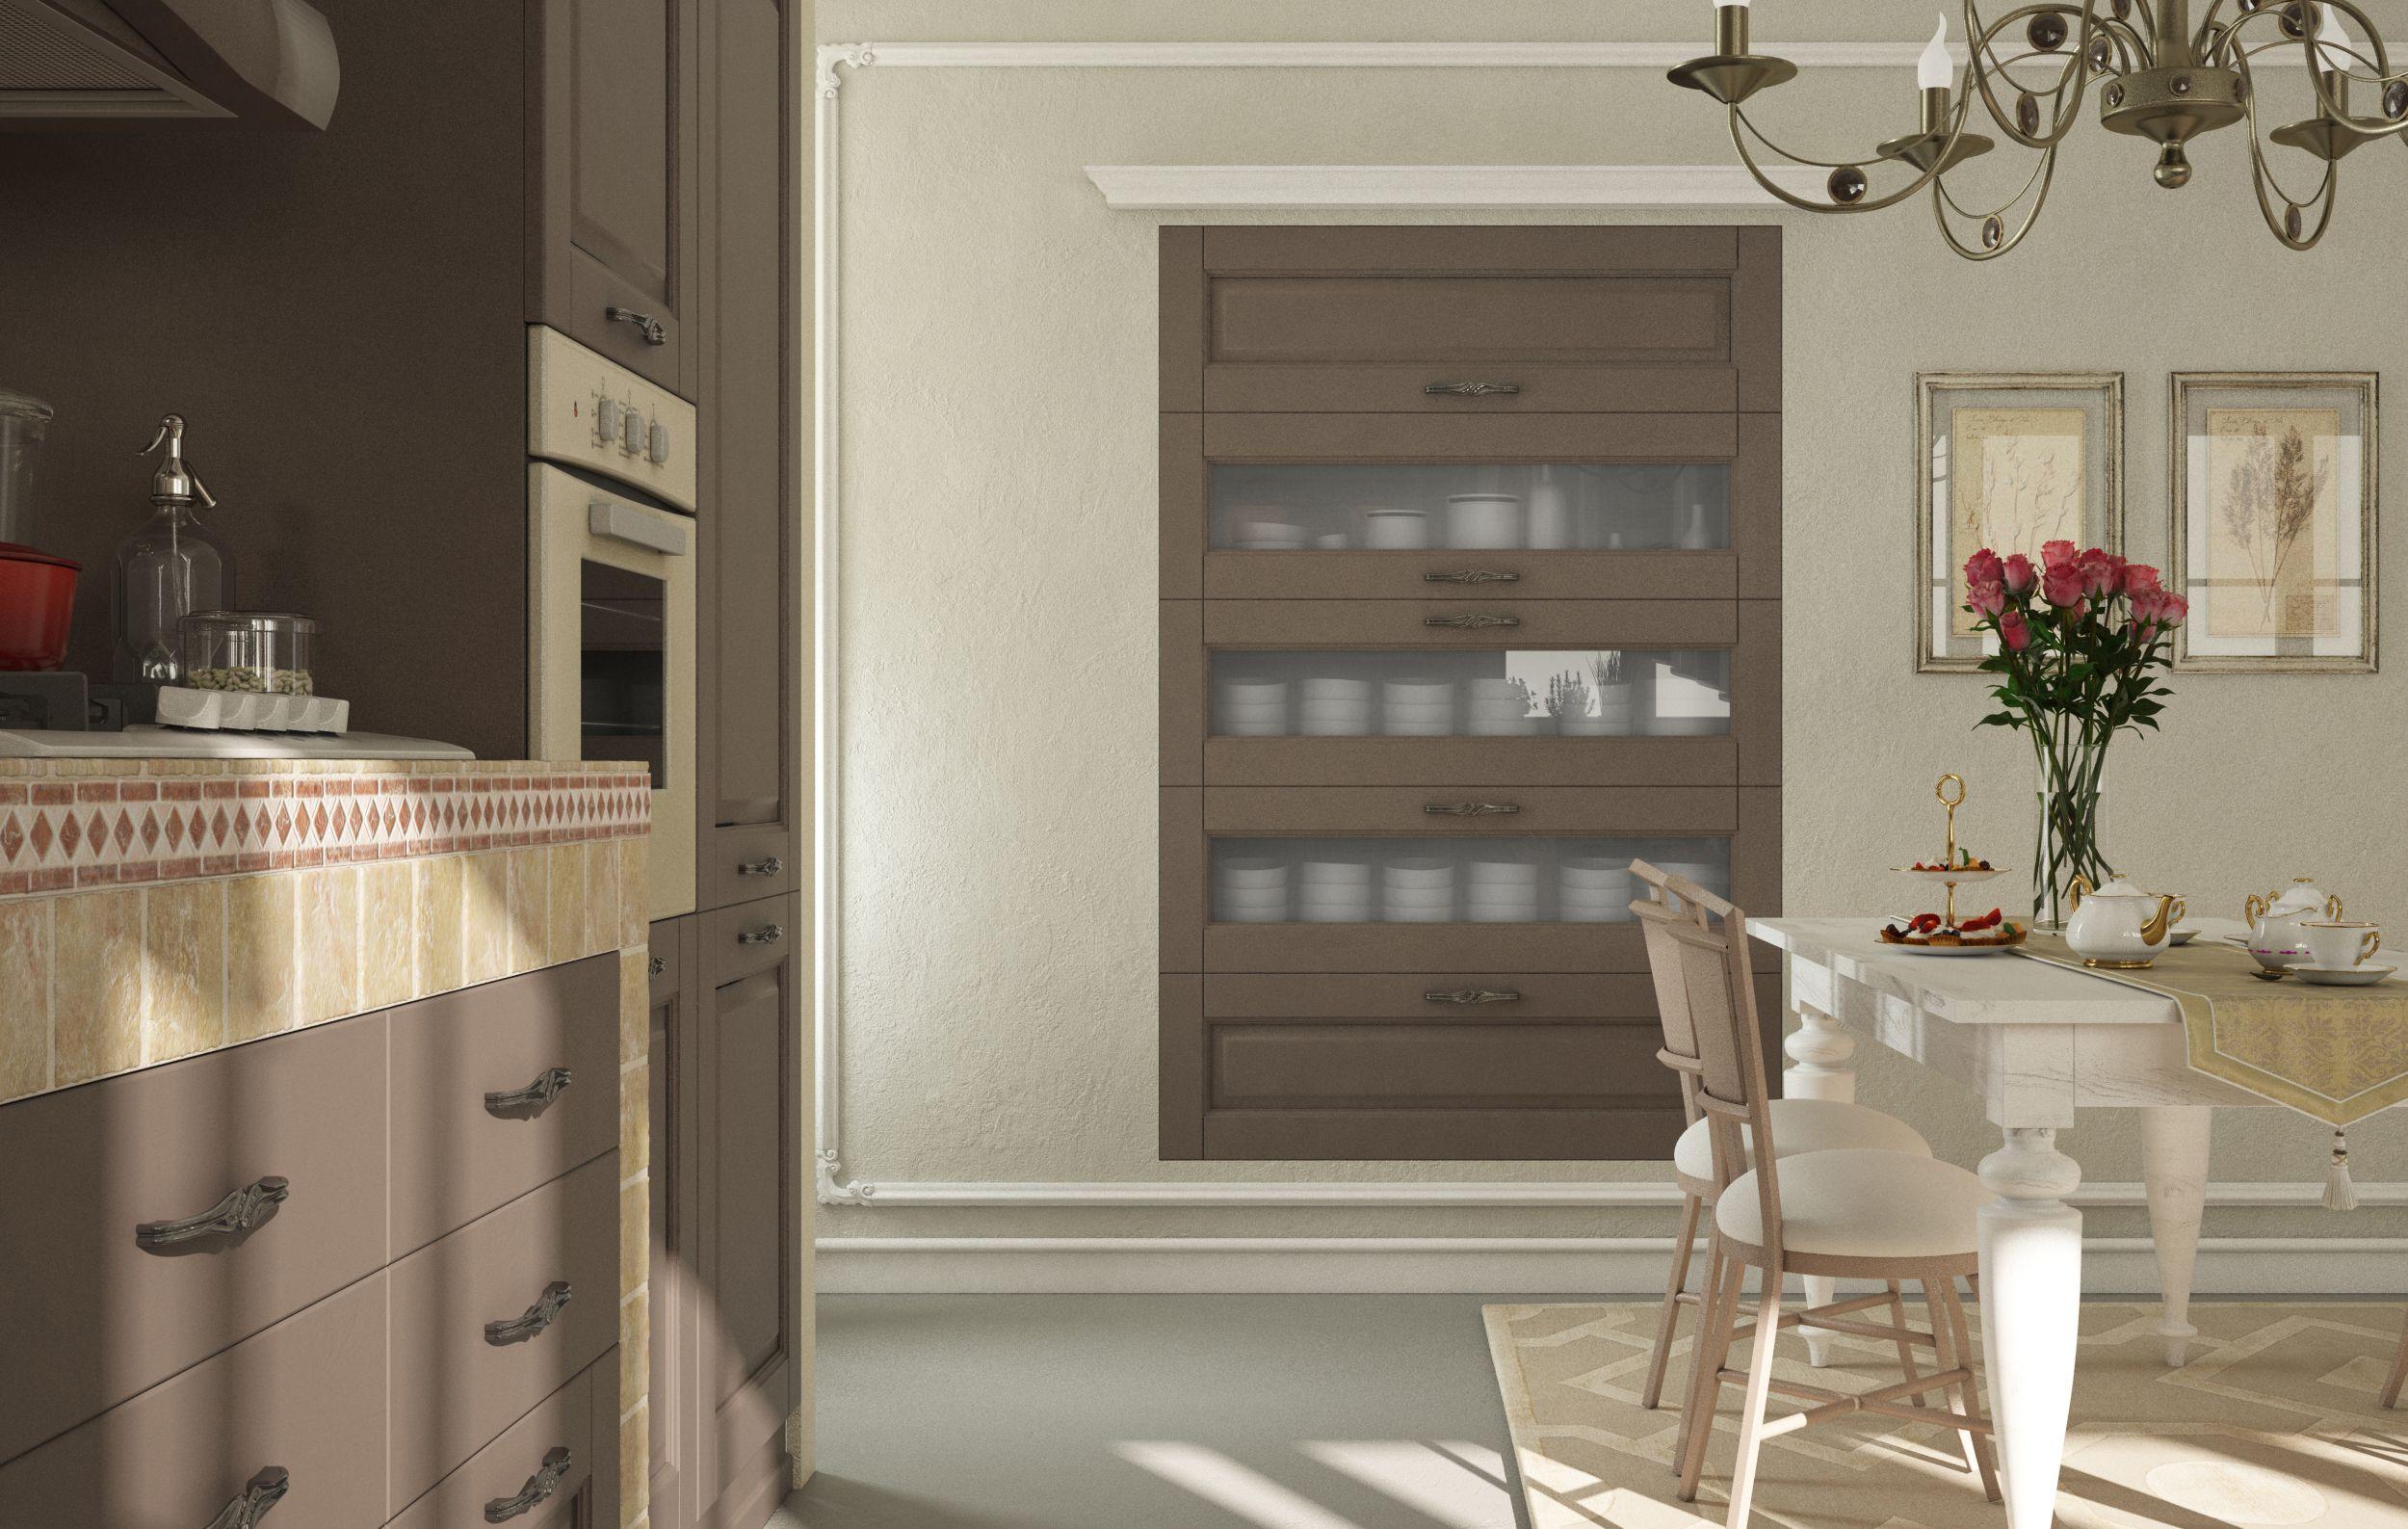 Cucine Aerre Moderne.Catalogo Sibilla Render By Ricciarelli Aerre Cucine